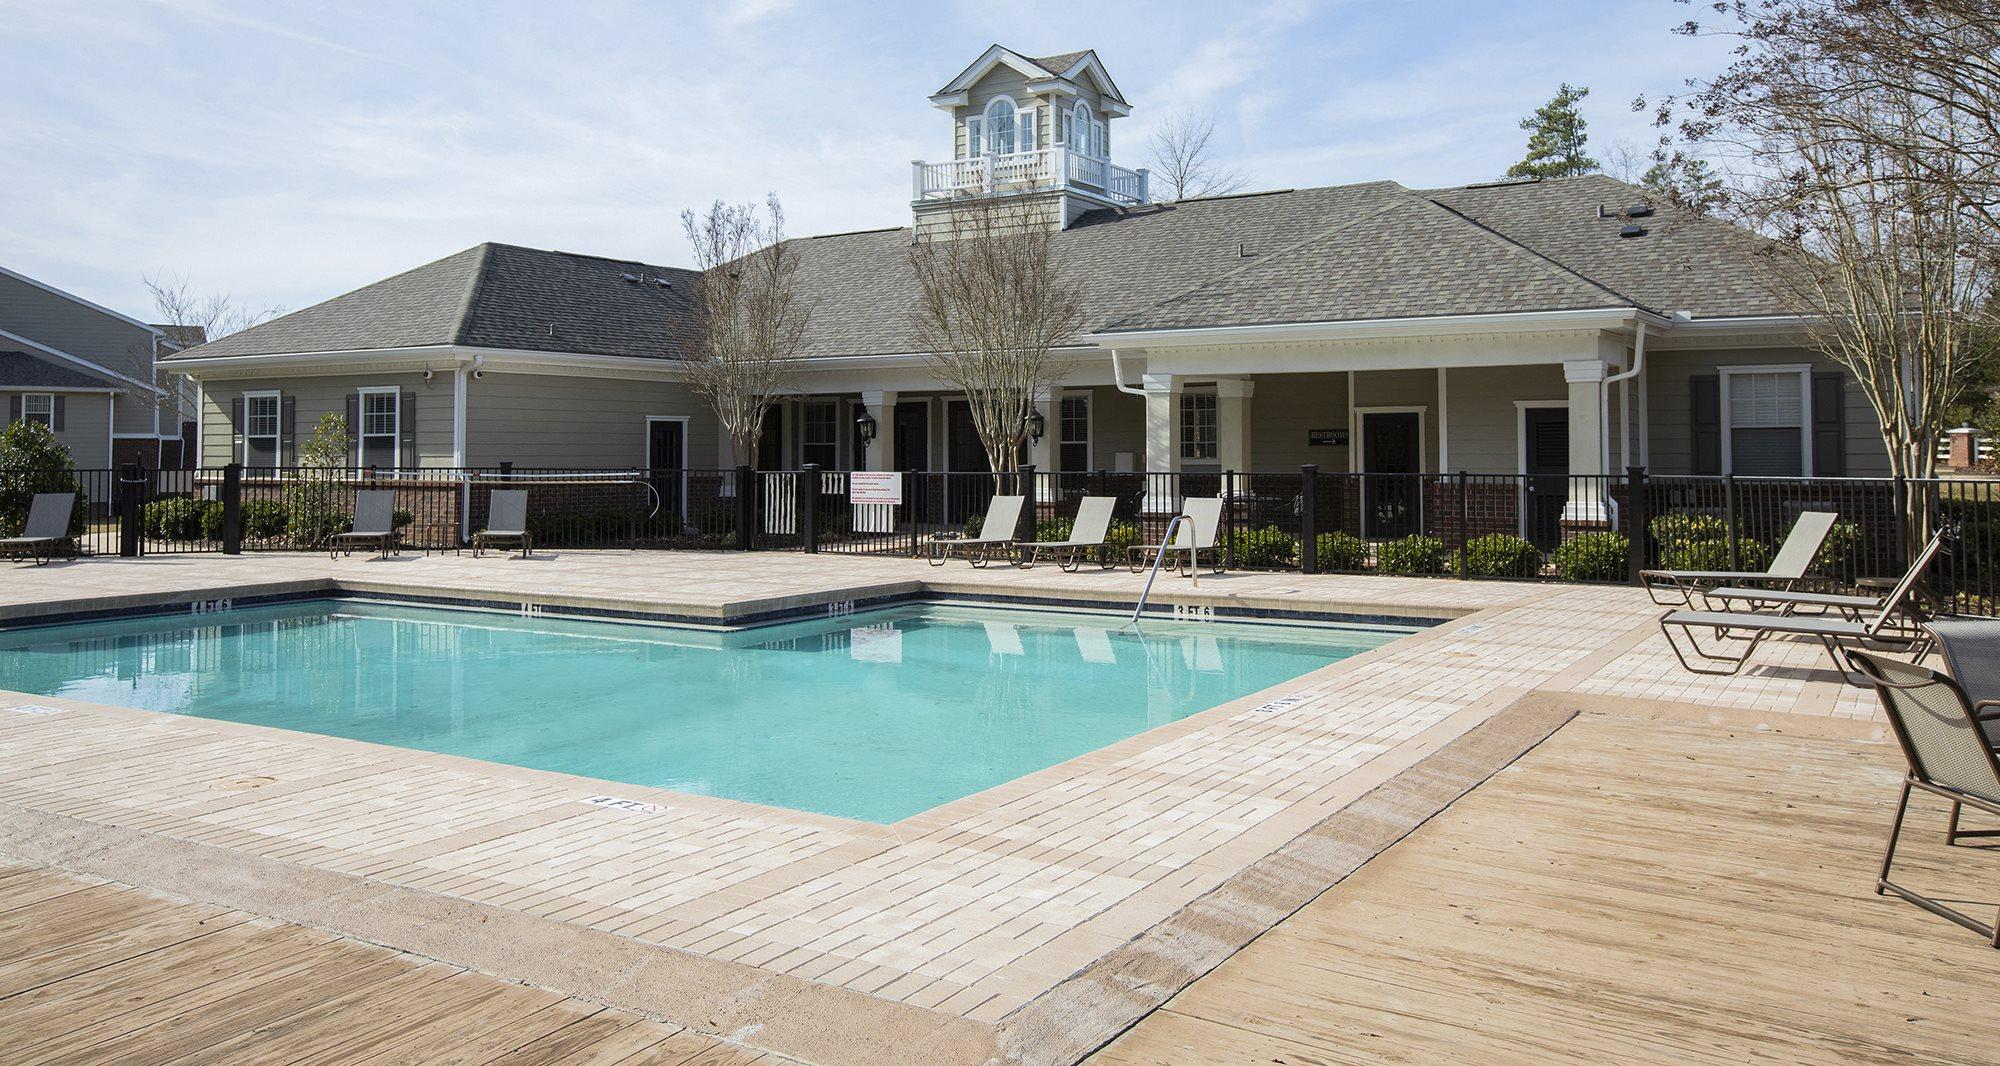 Pristine swimming pool